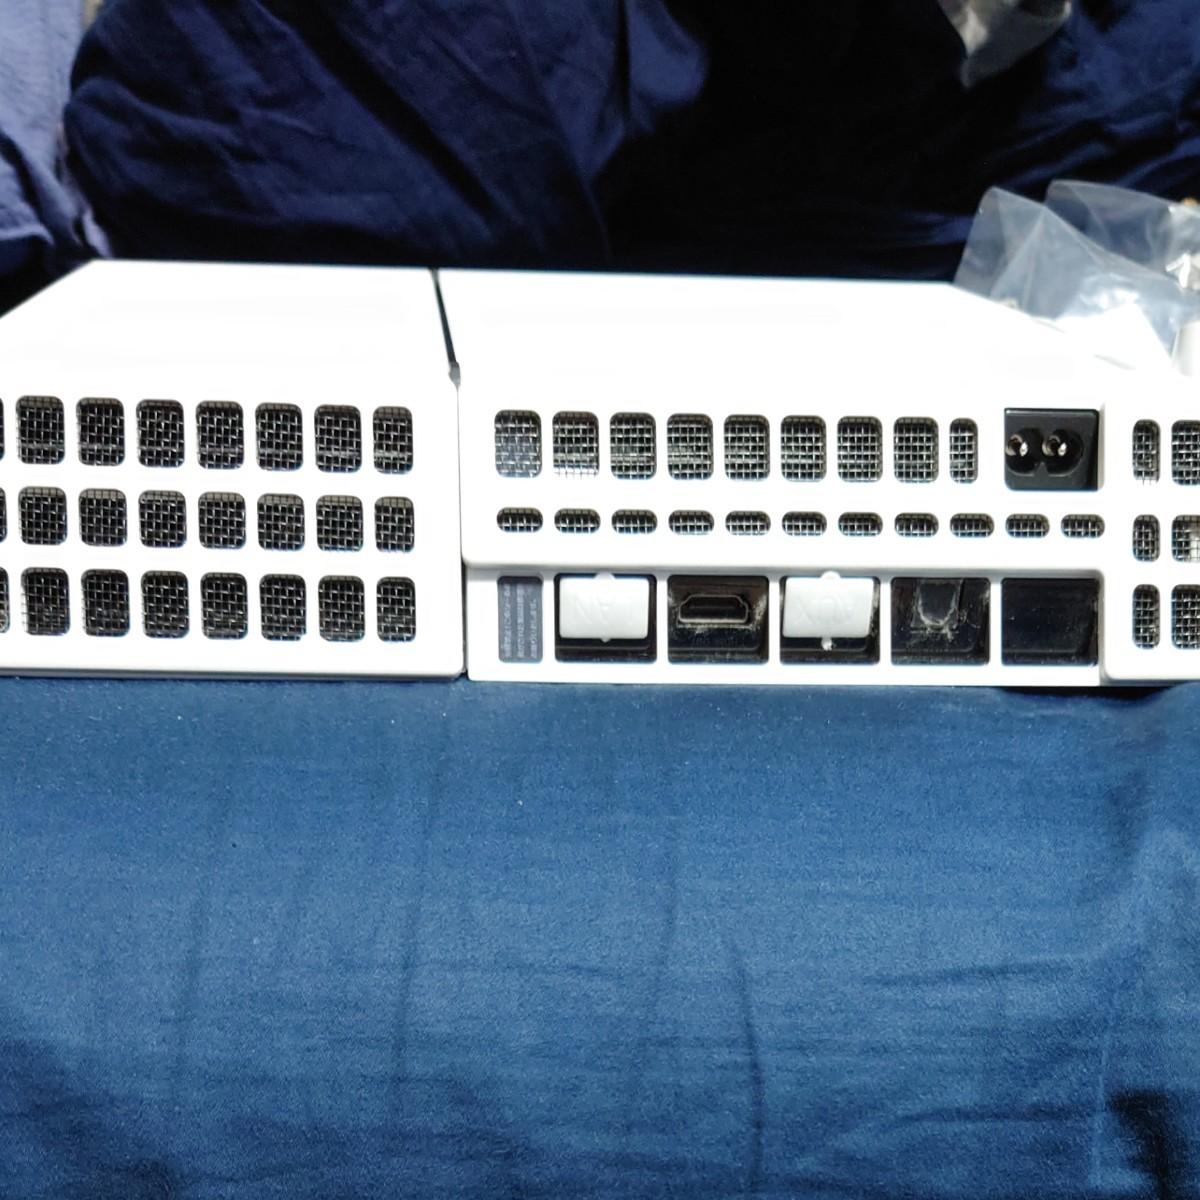 PS4本体、コントローラー2個(元々の付属品+青)、縦型スタンド、ホコリ防止